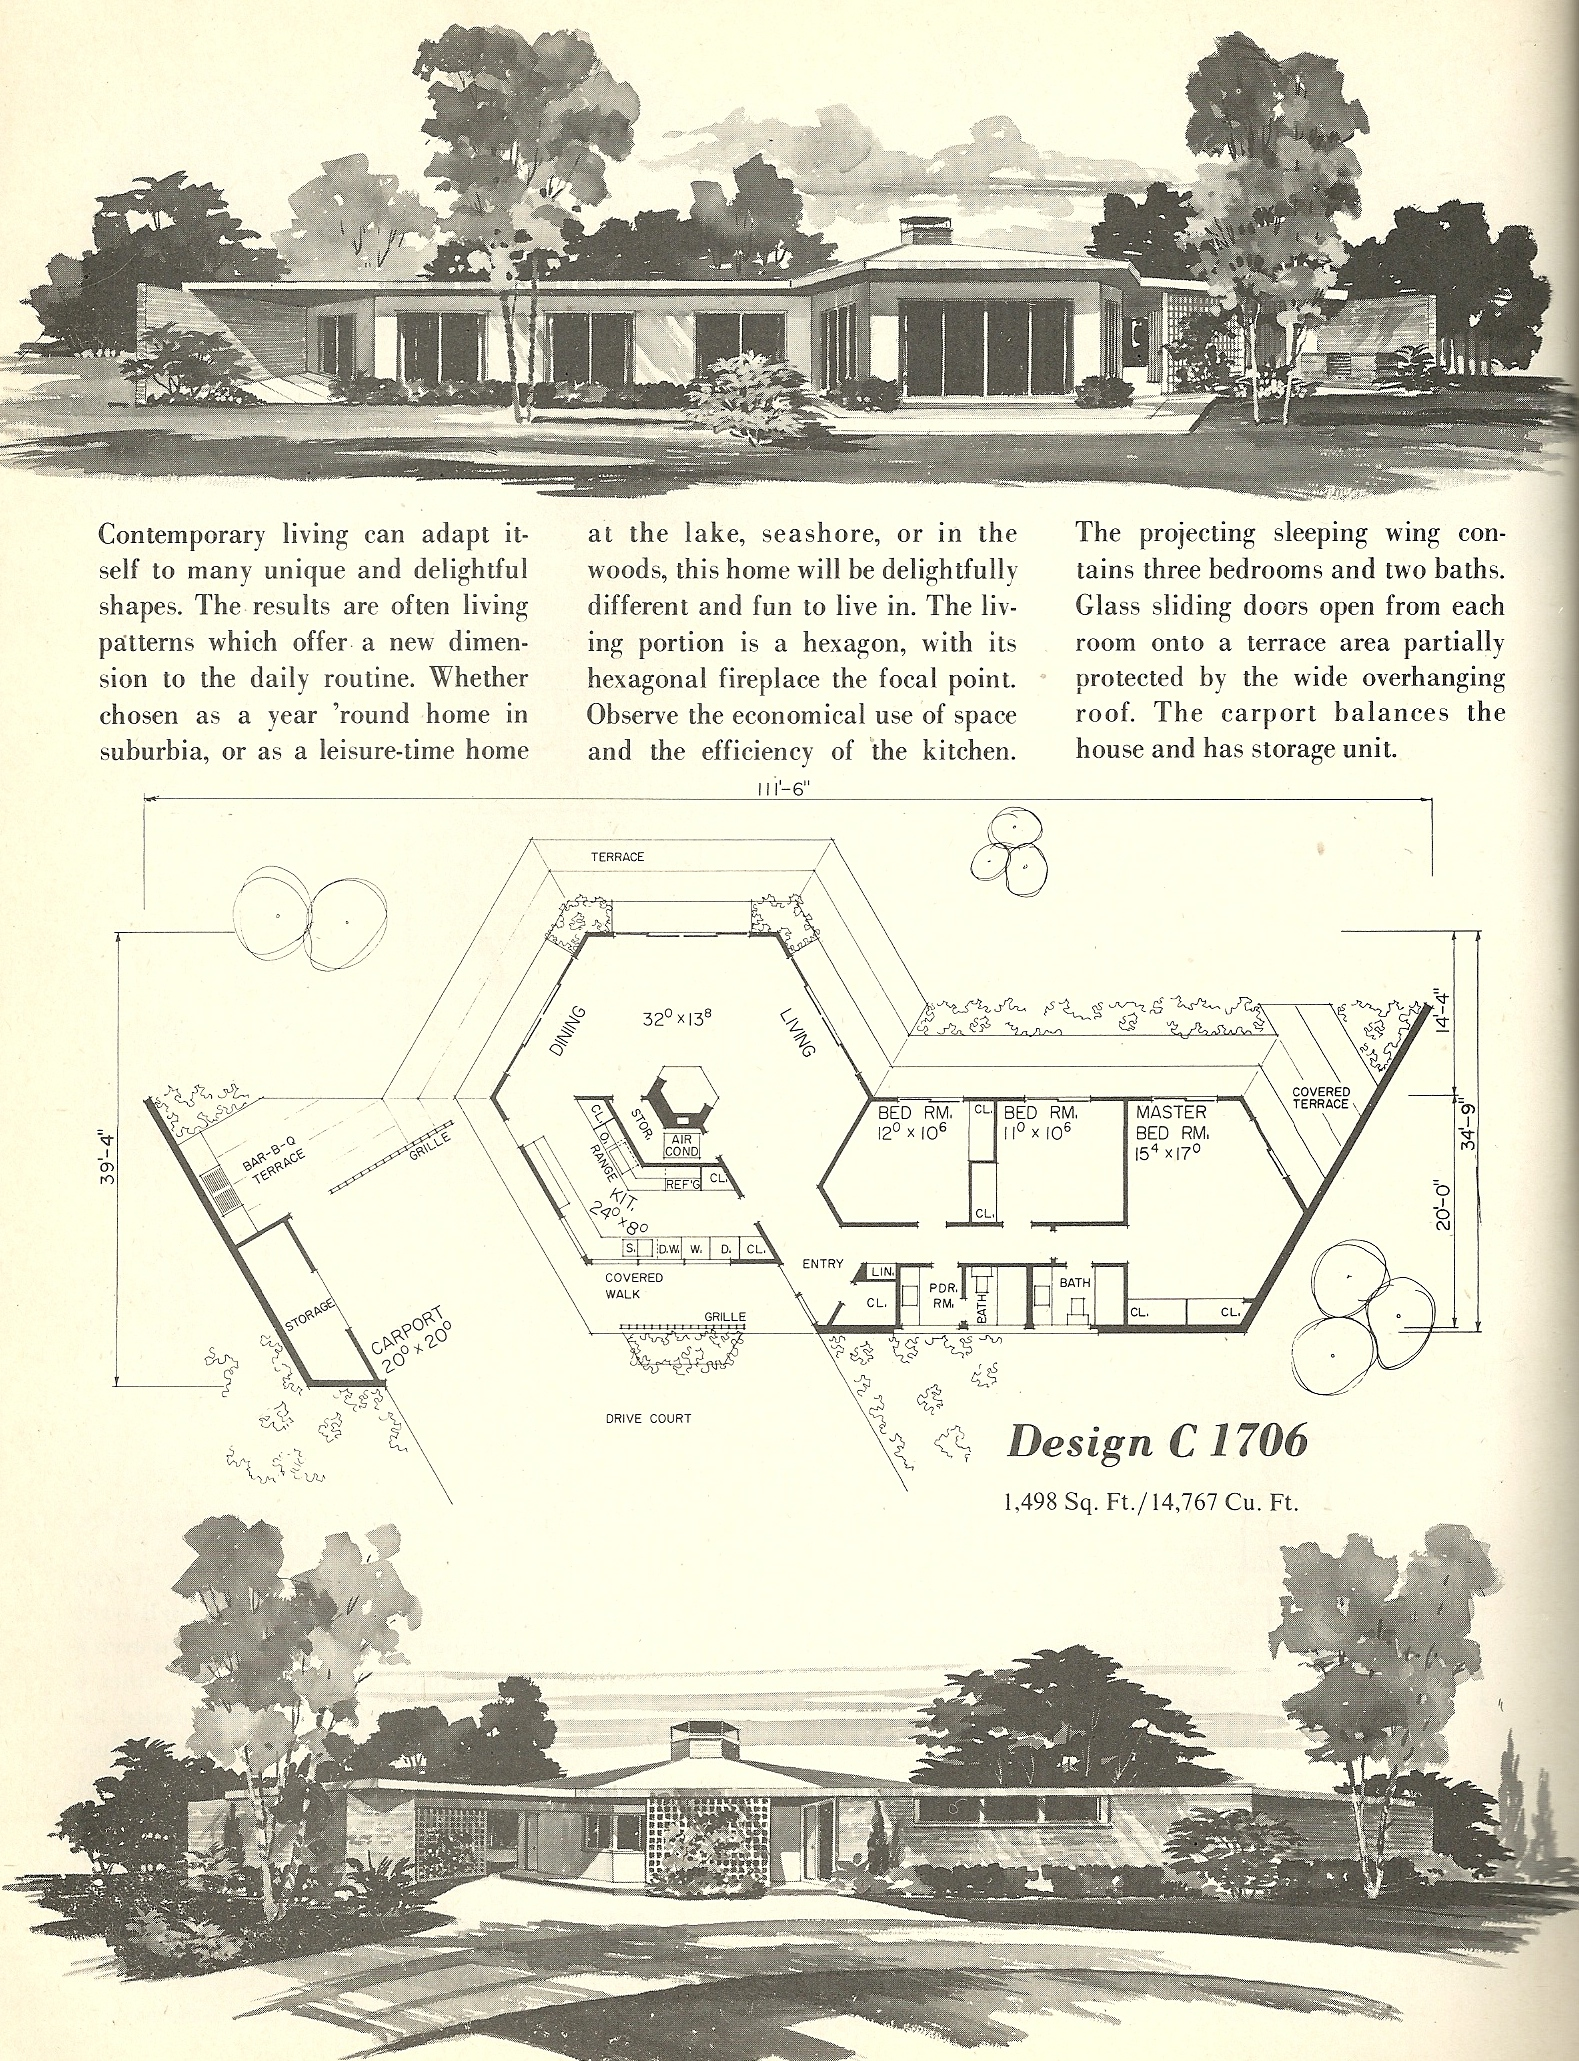 Vintage house plans 1706 antique alter ego for Retro modern house plans